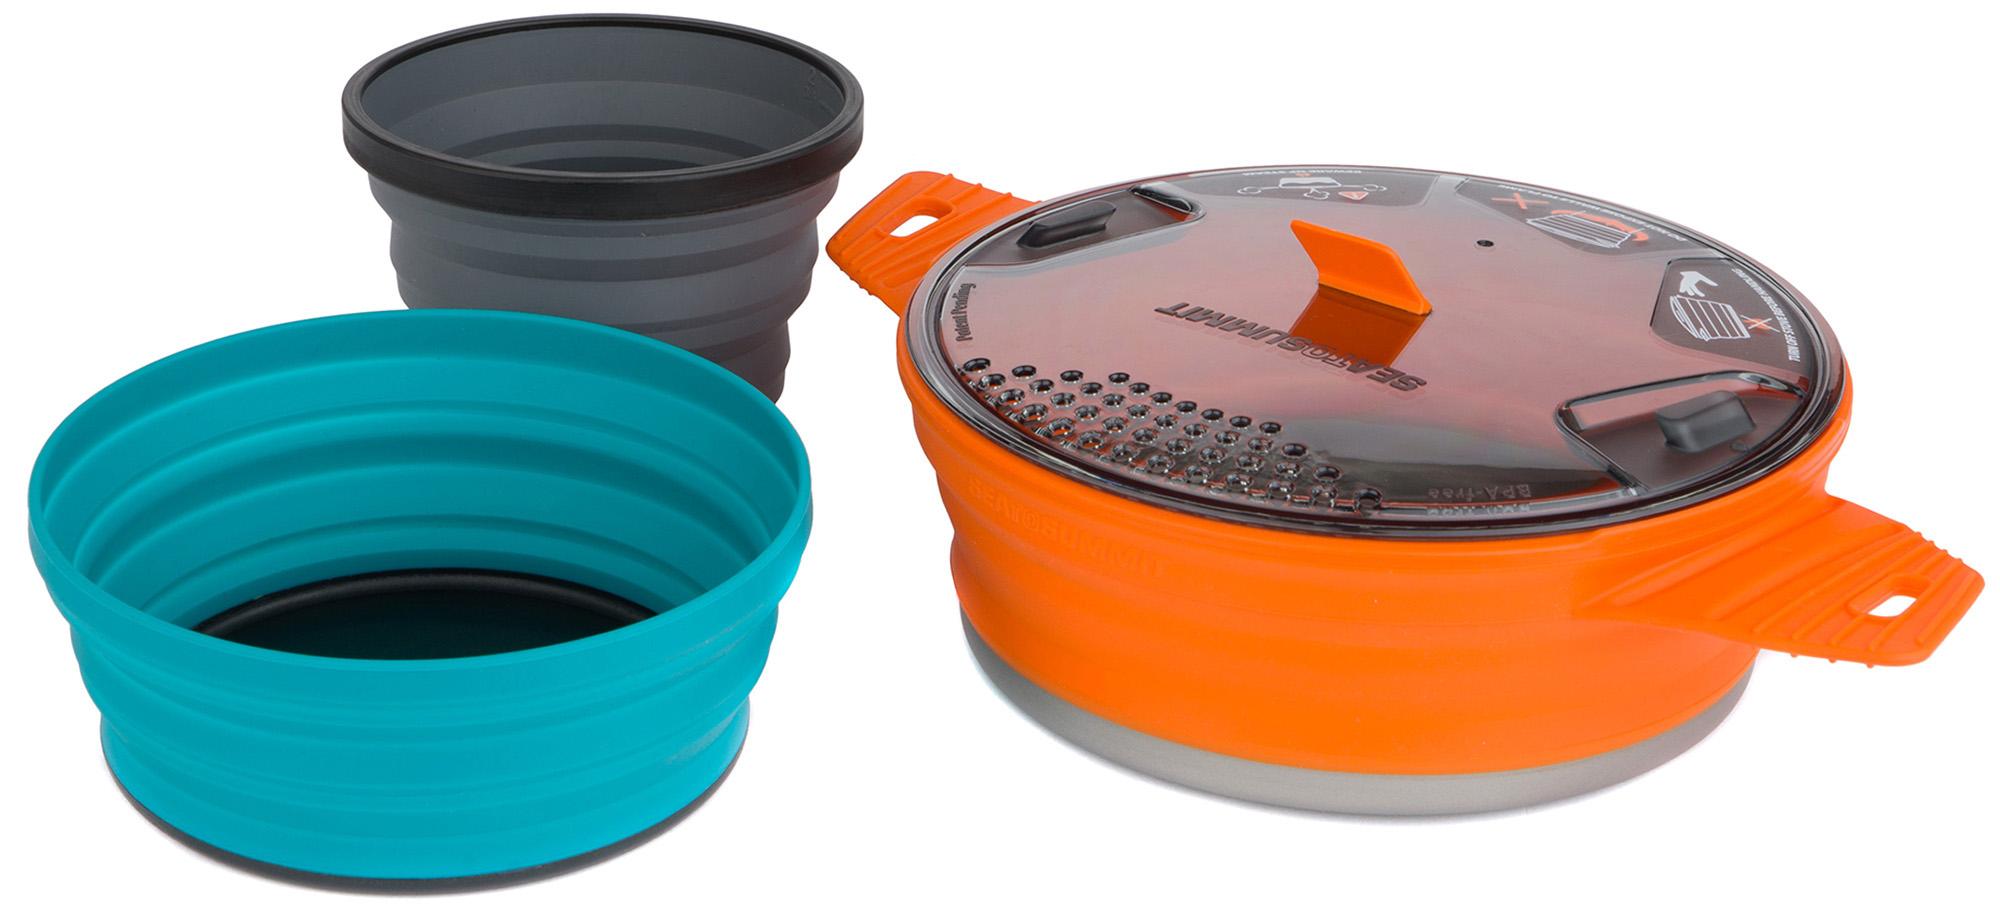 SEA TO SUMMIT Набор посуды SEA TO SUMMIT X-Set комплектующие для спортивных сумок sea to summit 56928afrb25spp 2015 afrb25srpp